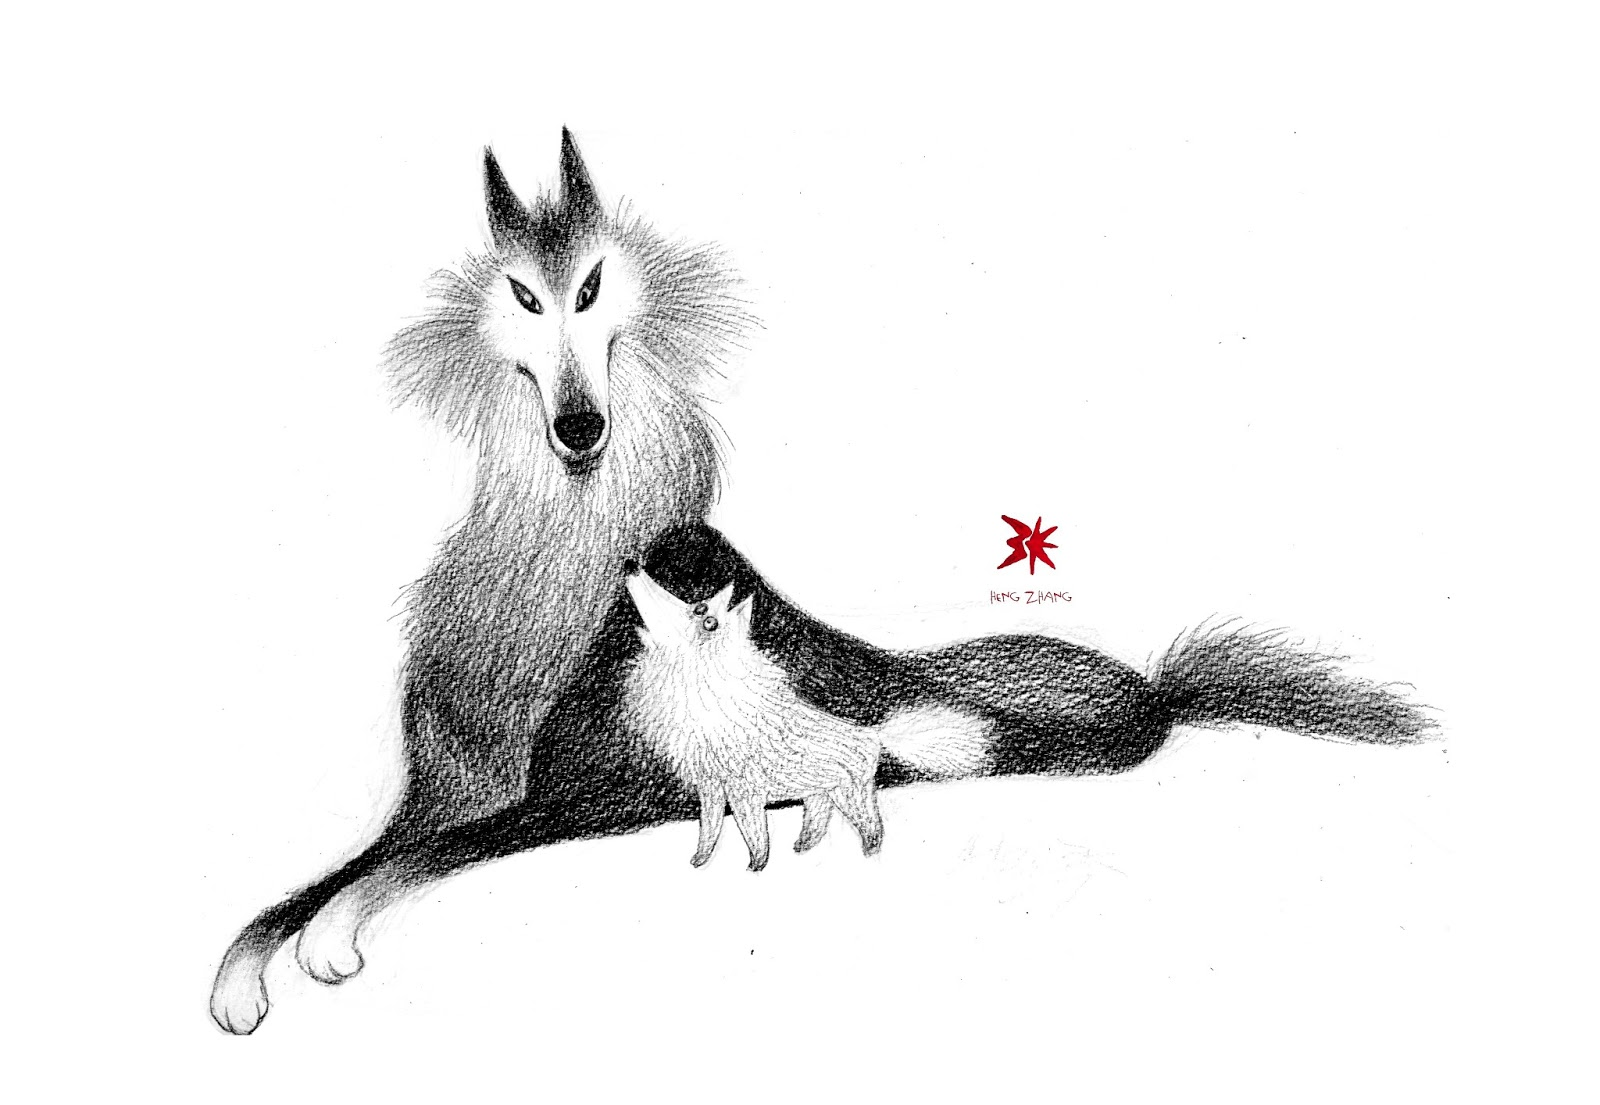 Squash 'n Sketch: Wolves